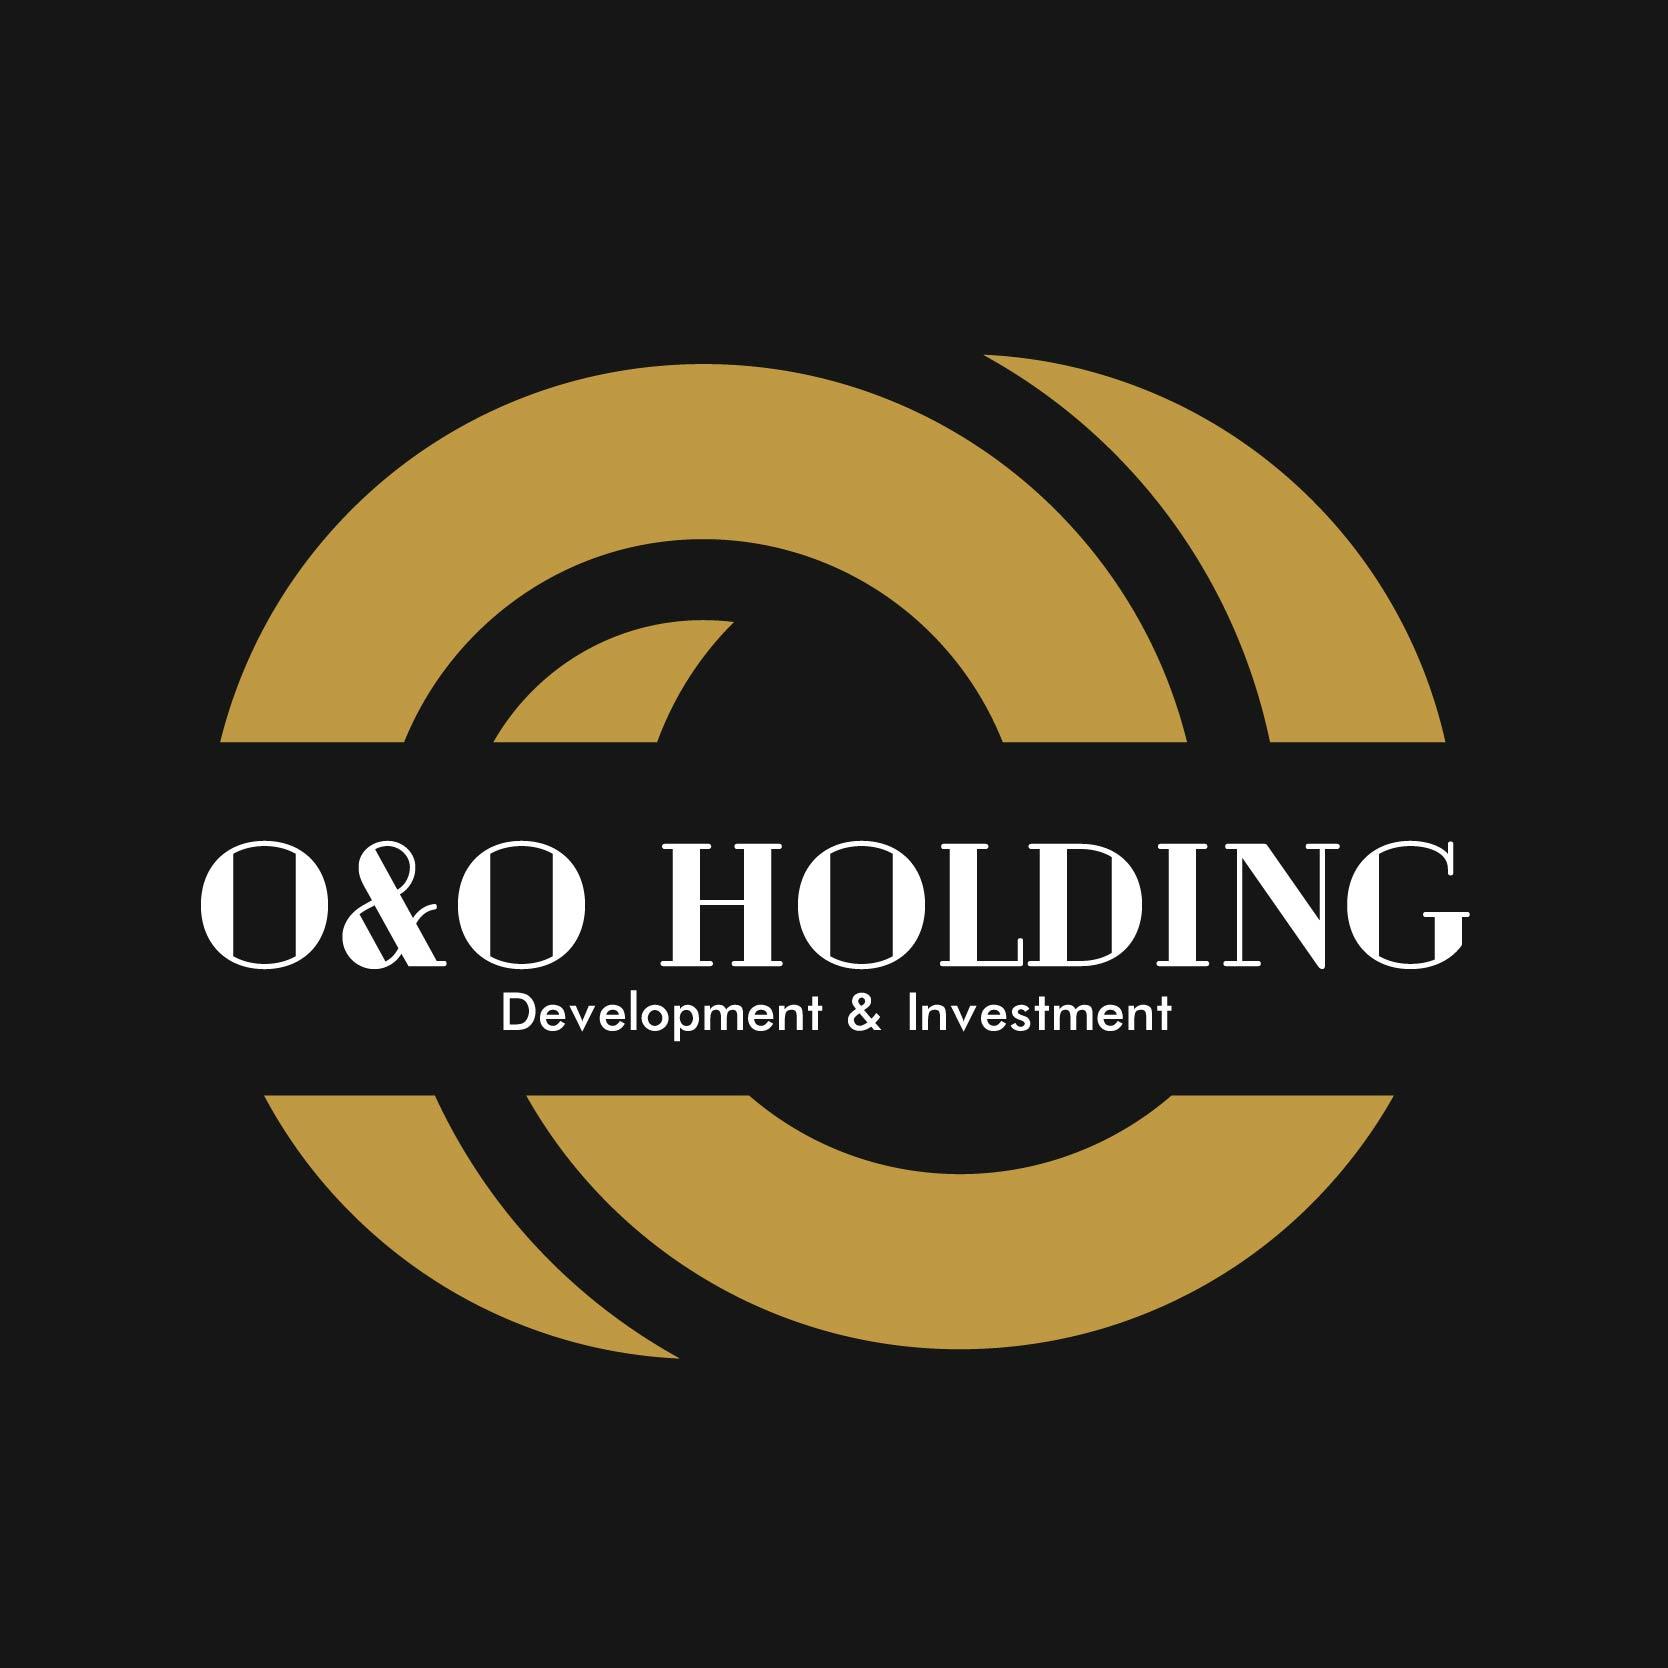 "Разработка Логотипа +  Фирменного знака для компании ""O & O HOLDING"" фото f_0215c7e4e8b9ba11.jpg"